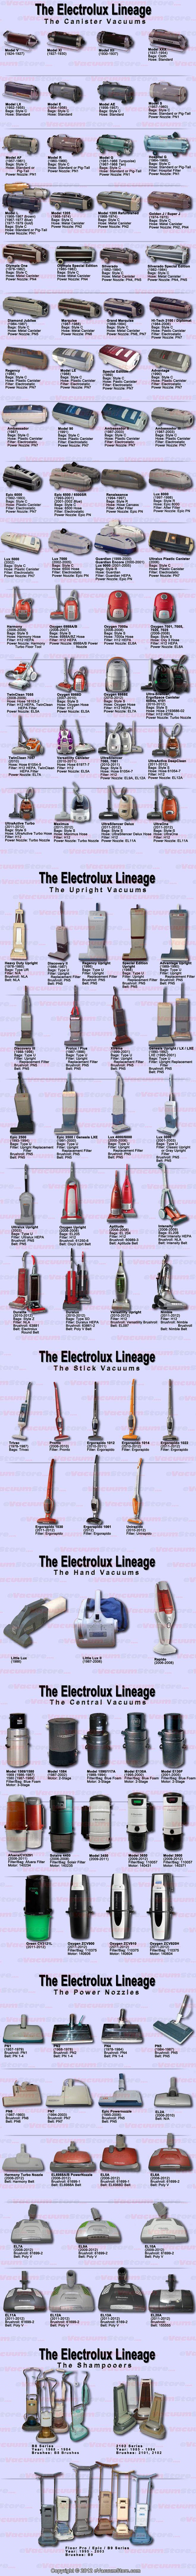 eVacuumStore Blog | History of All Electrolux Vacuum Cleaner Models